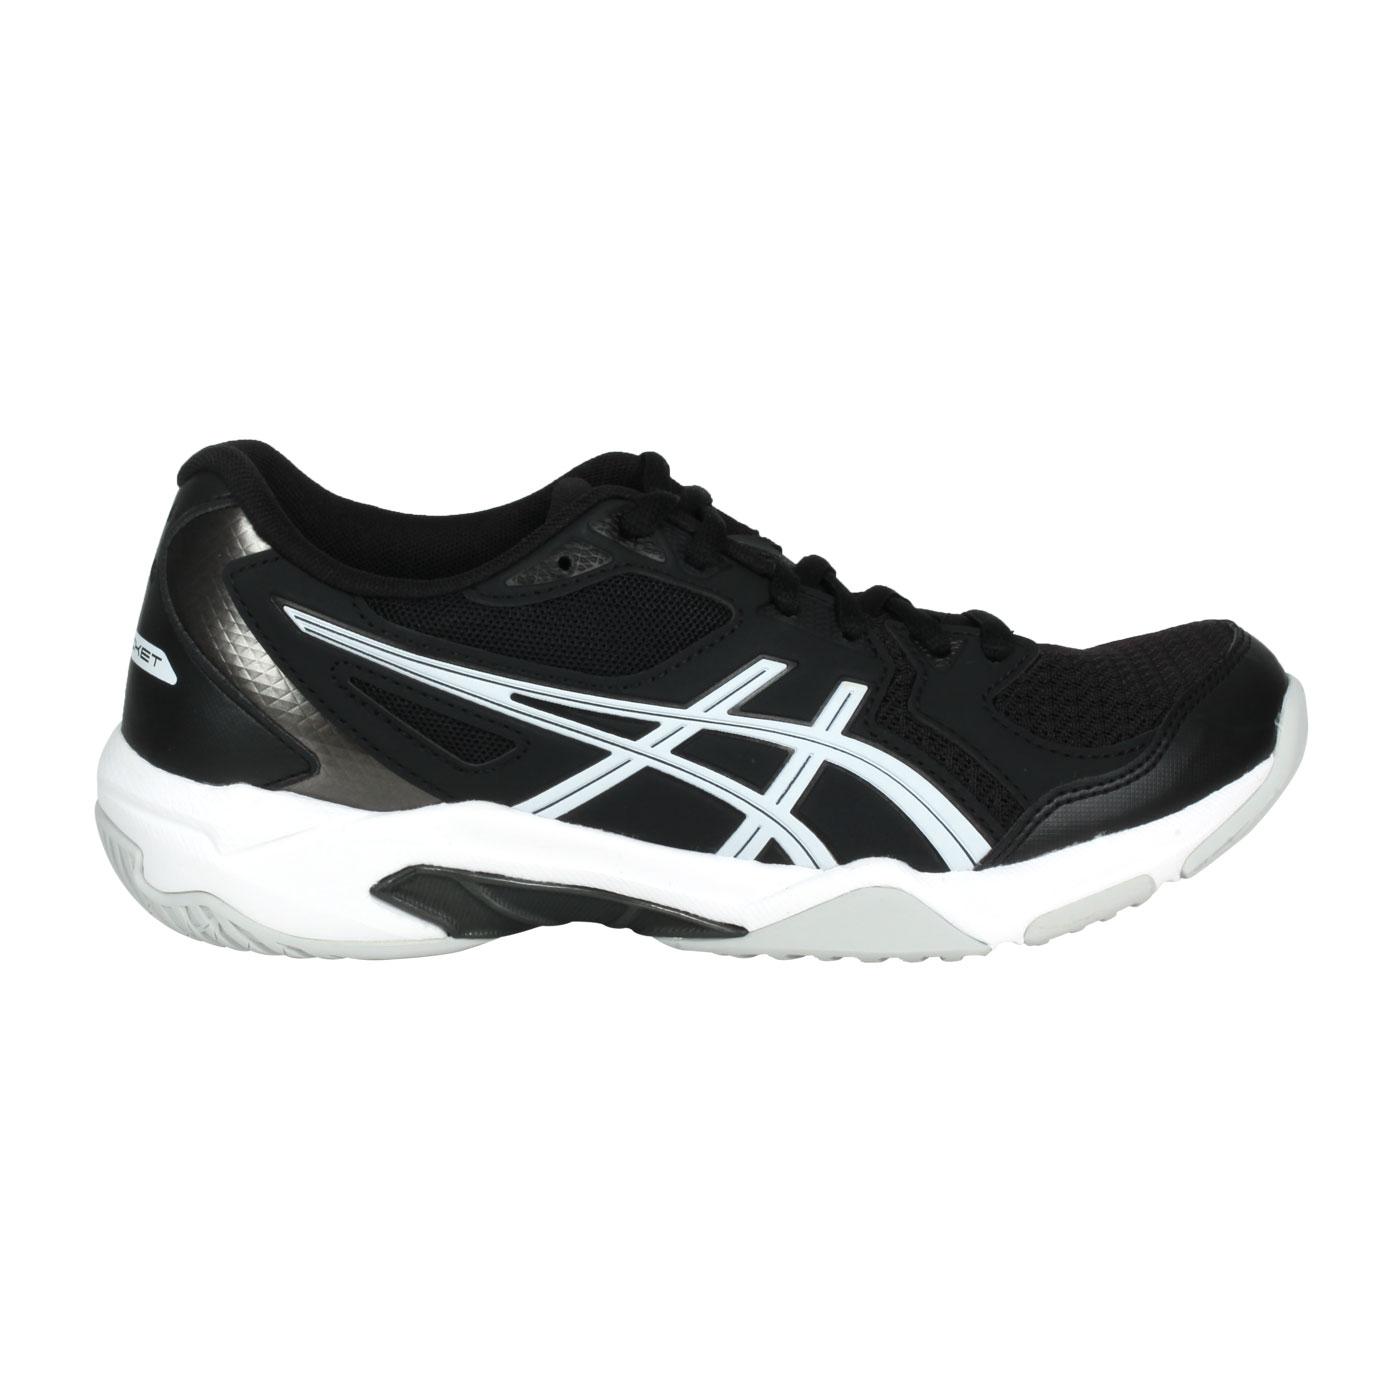 ASICS 女款排羽球鞋  @GEL-ROCKET 10@1072A056-001